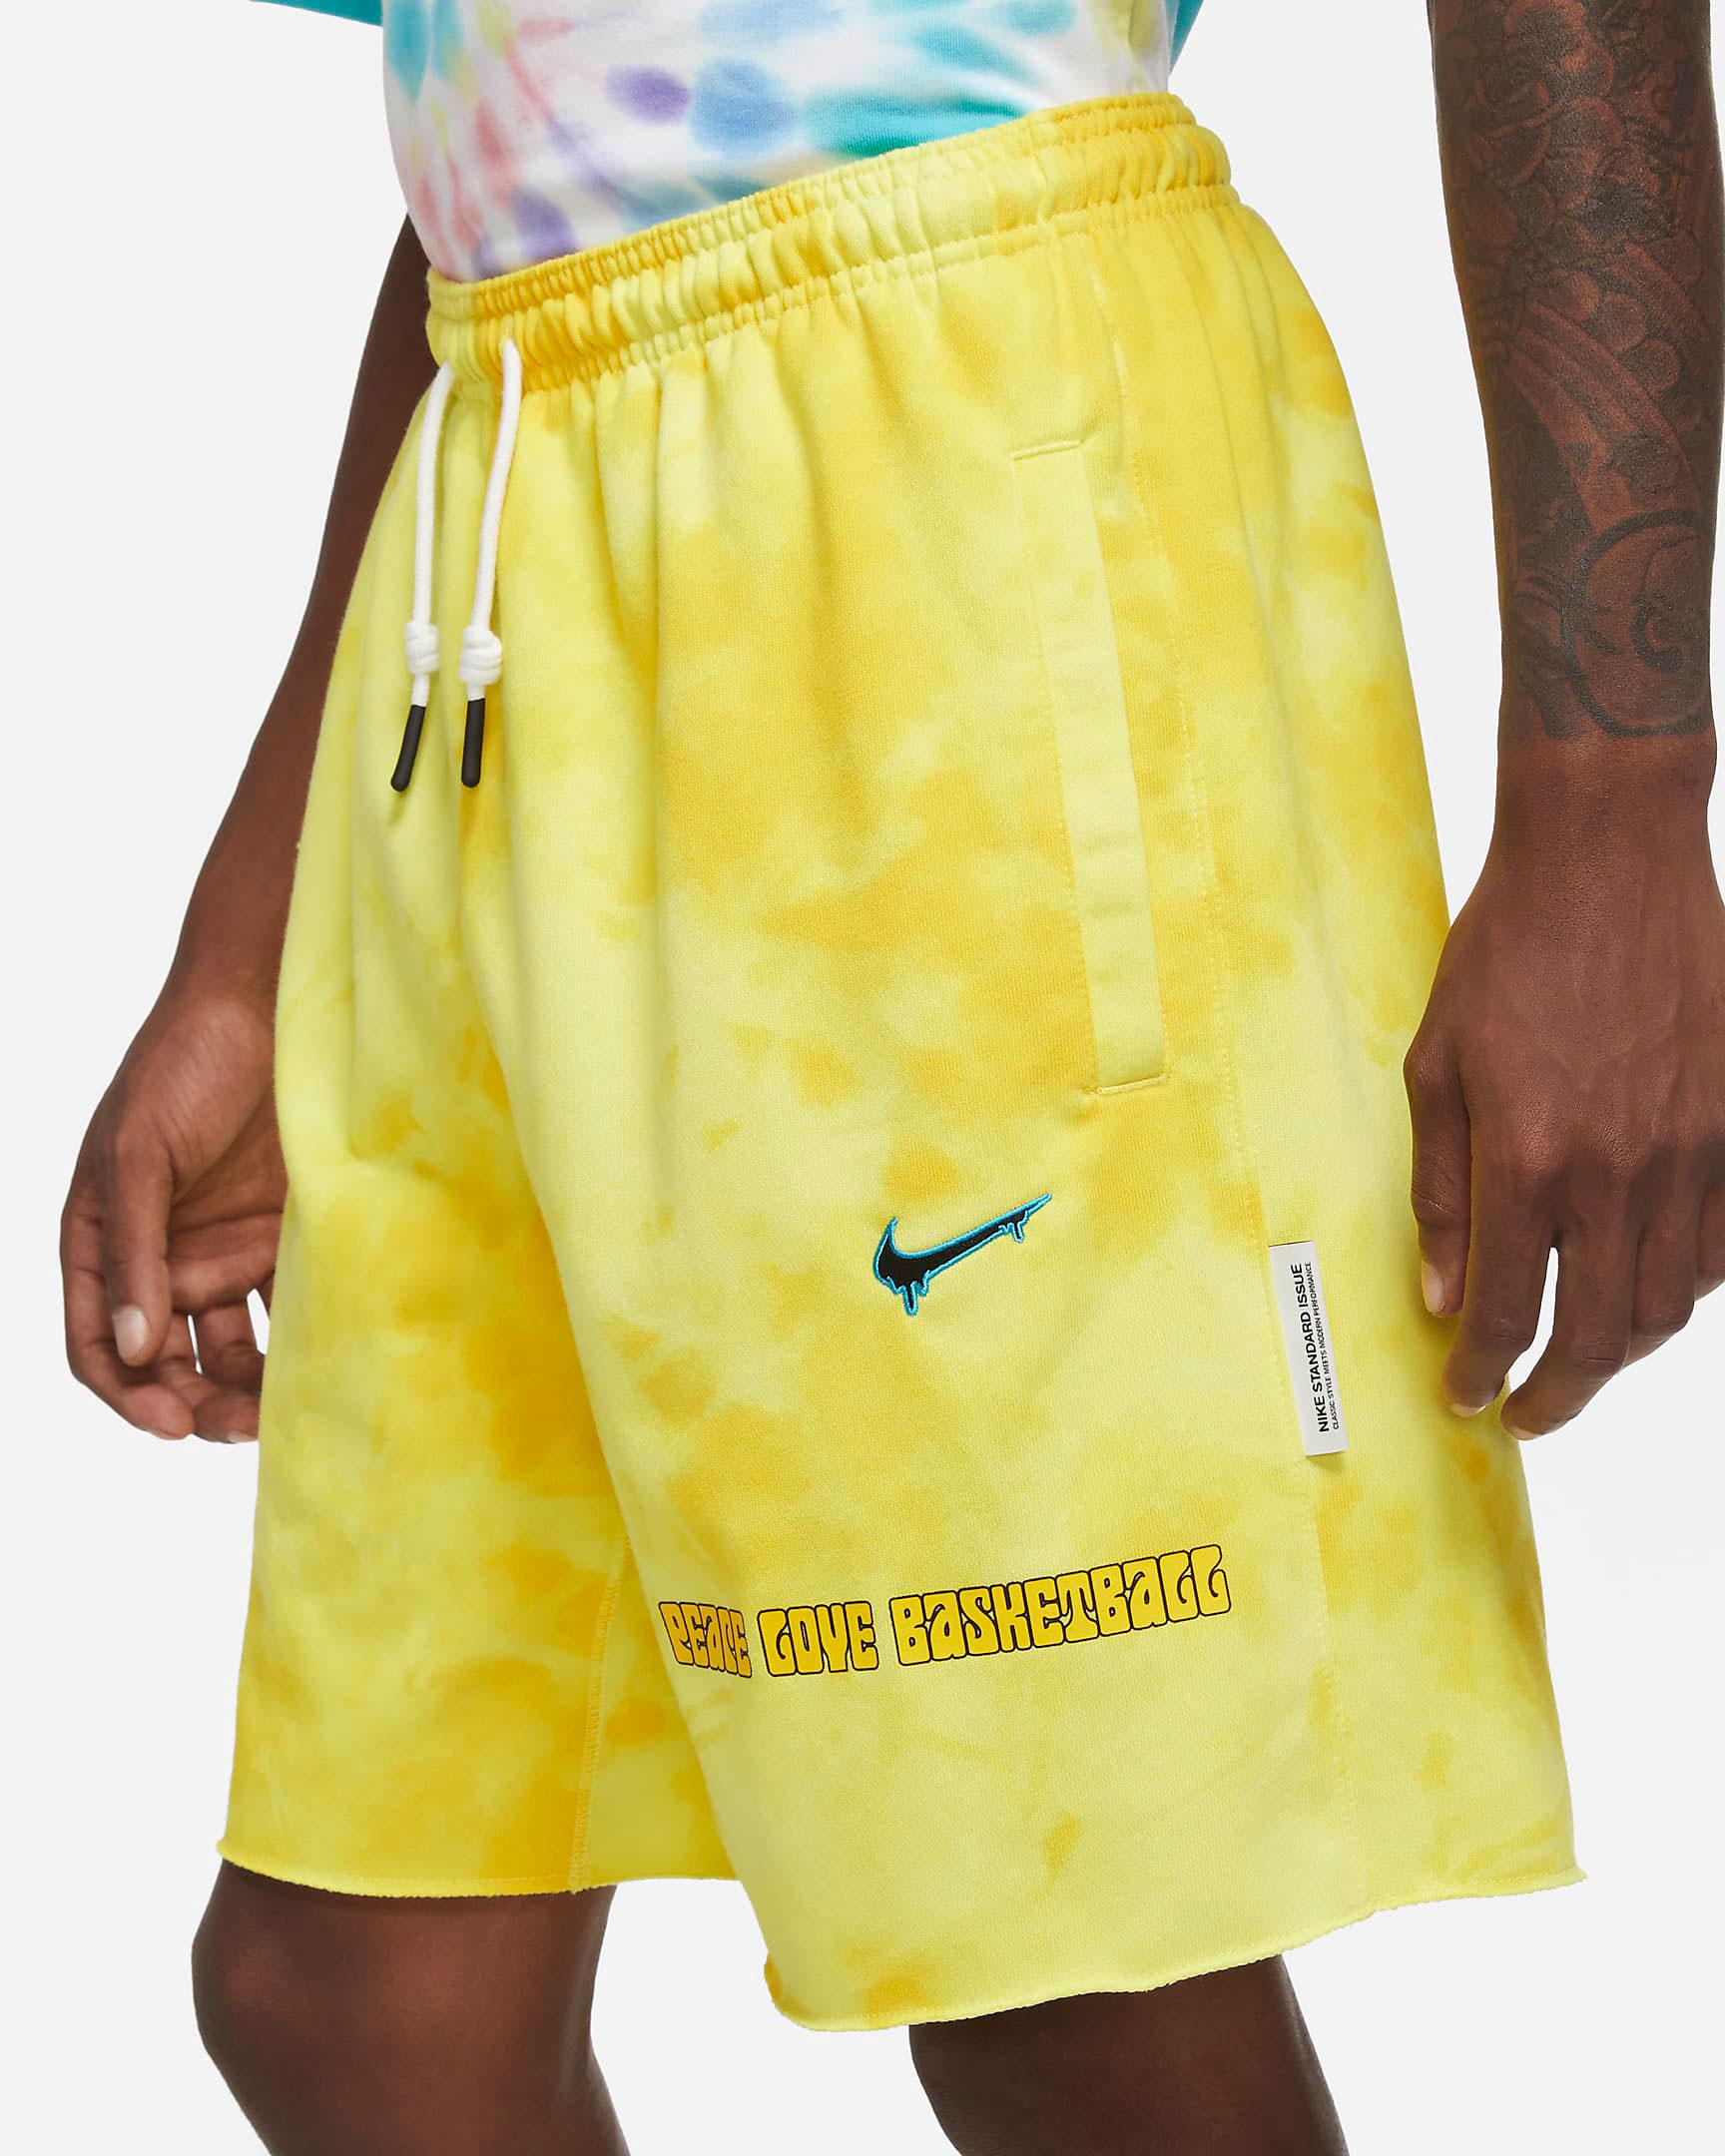 nike-peace-love-basketball-shorts-yellow-1